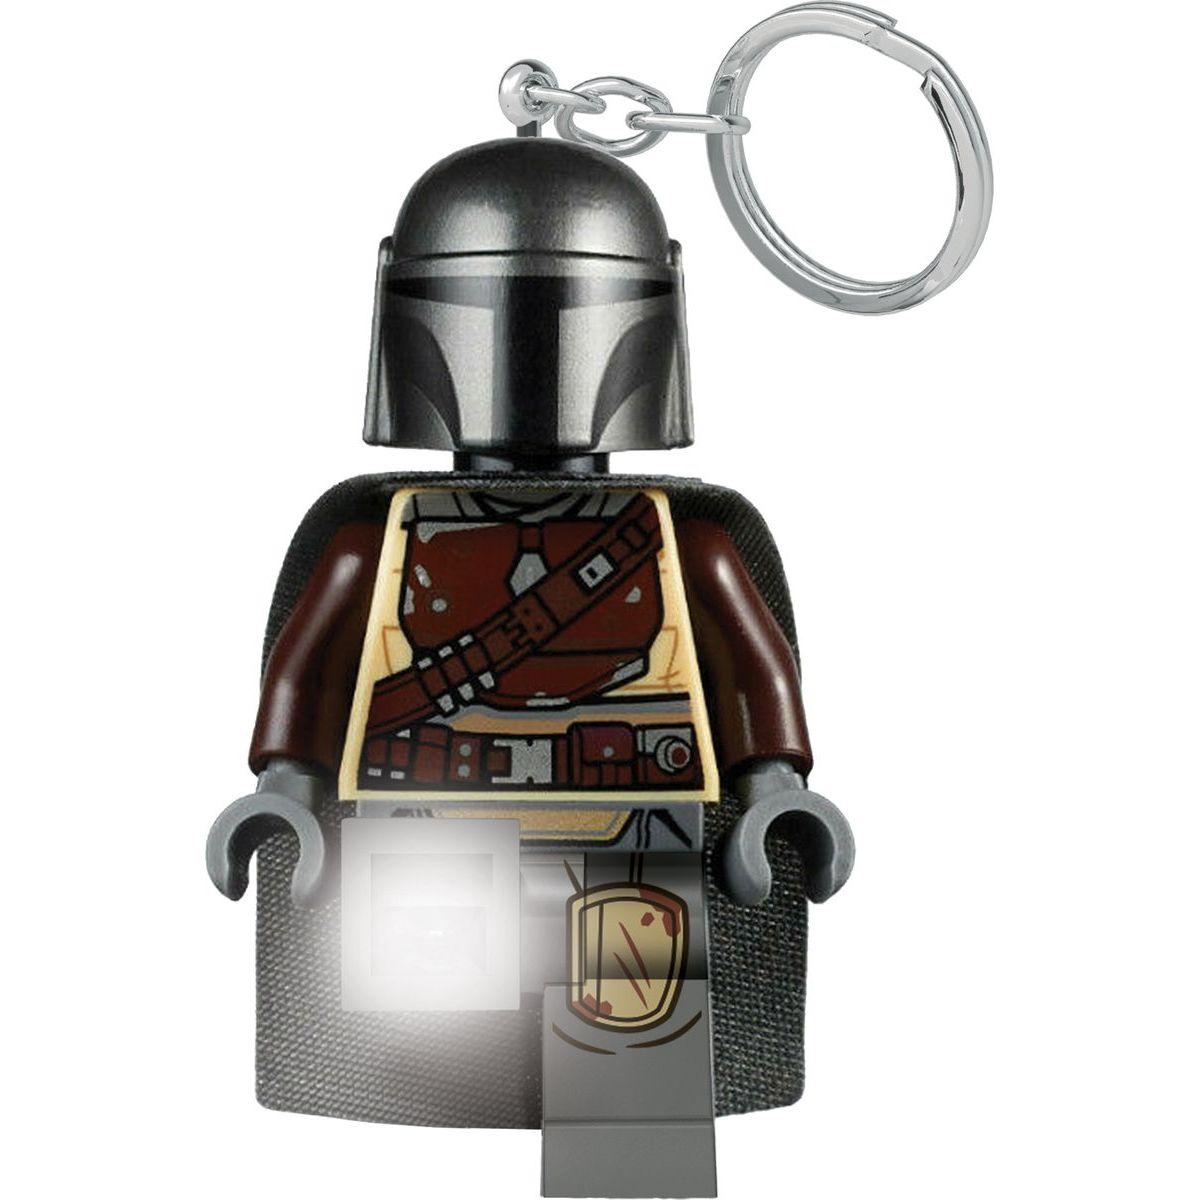 LEGO Star Wars Mandalorian svietiaca figúrka